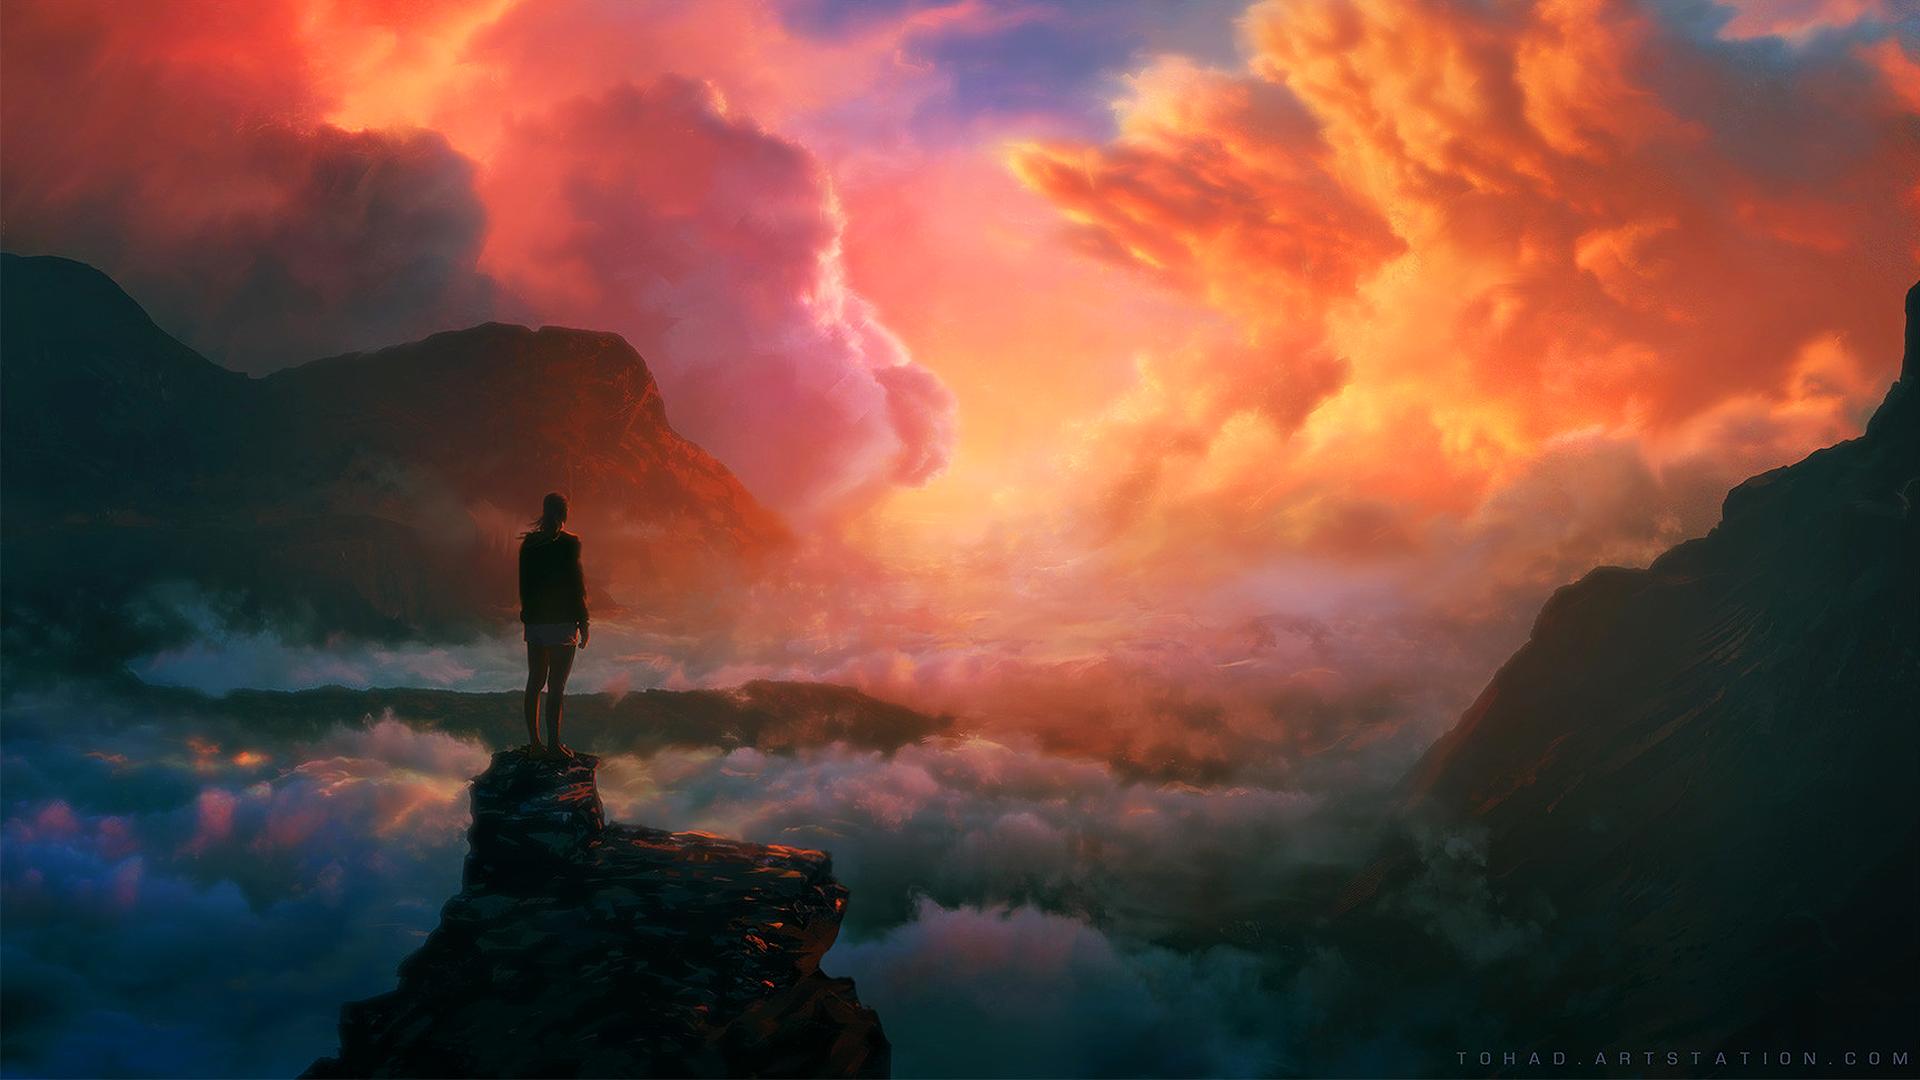 General 1920x1080 Sylvain Sarrailh artwork clouds mountains alone standing landscape